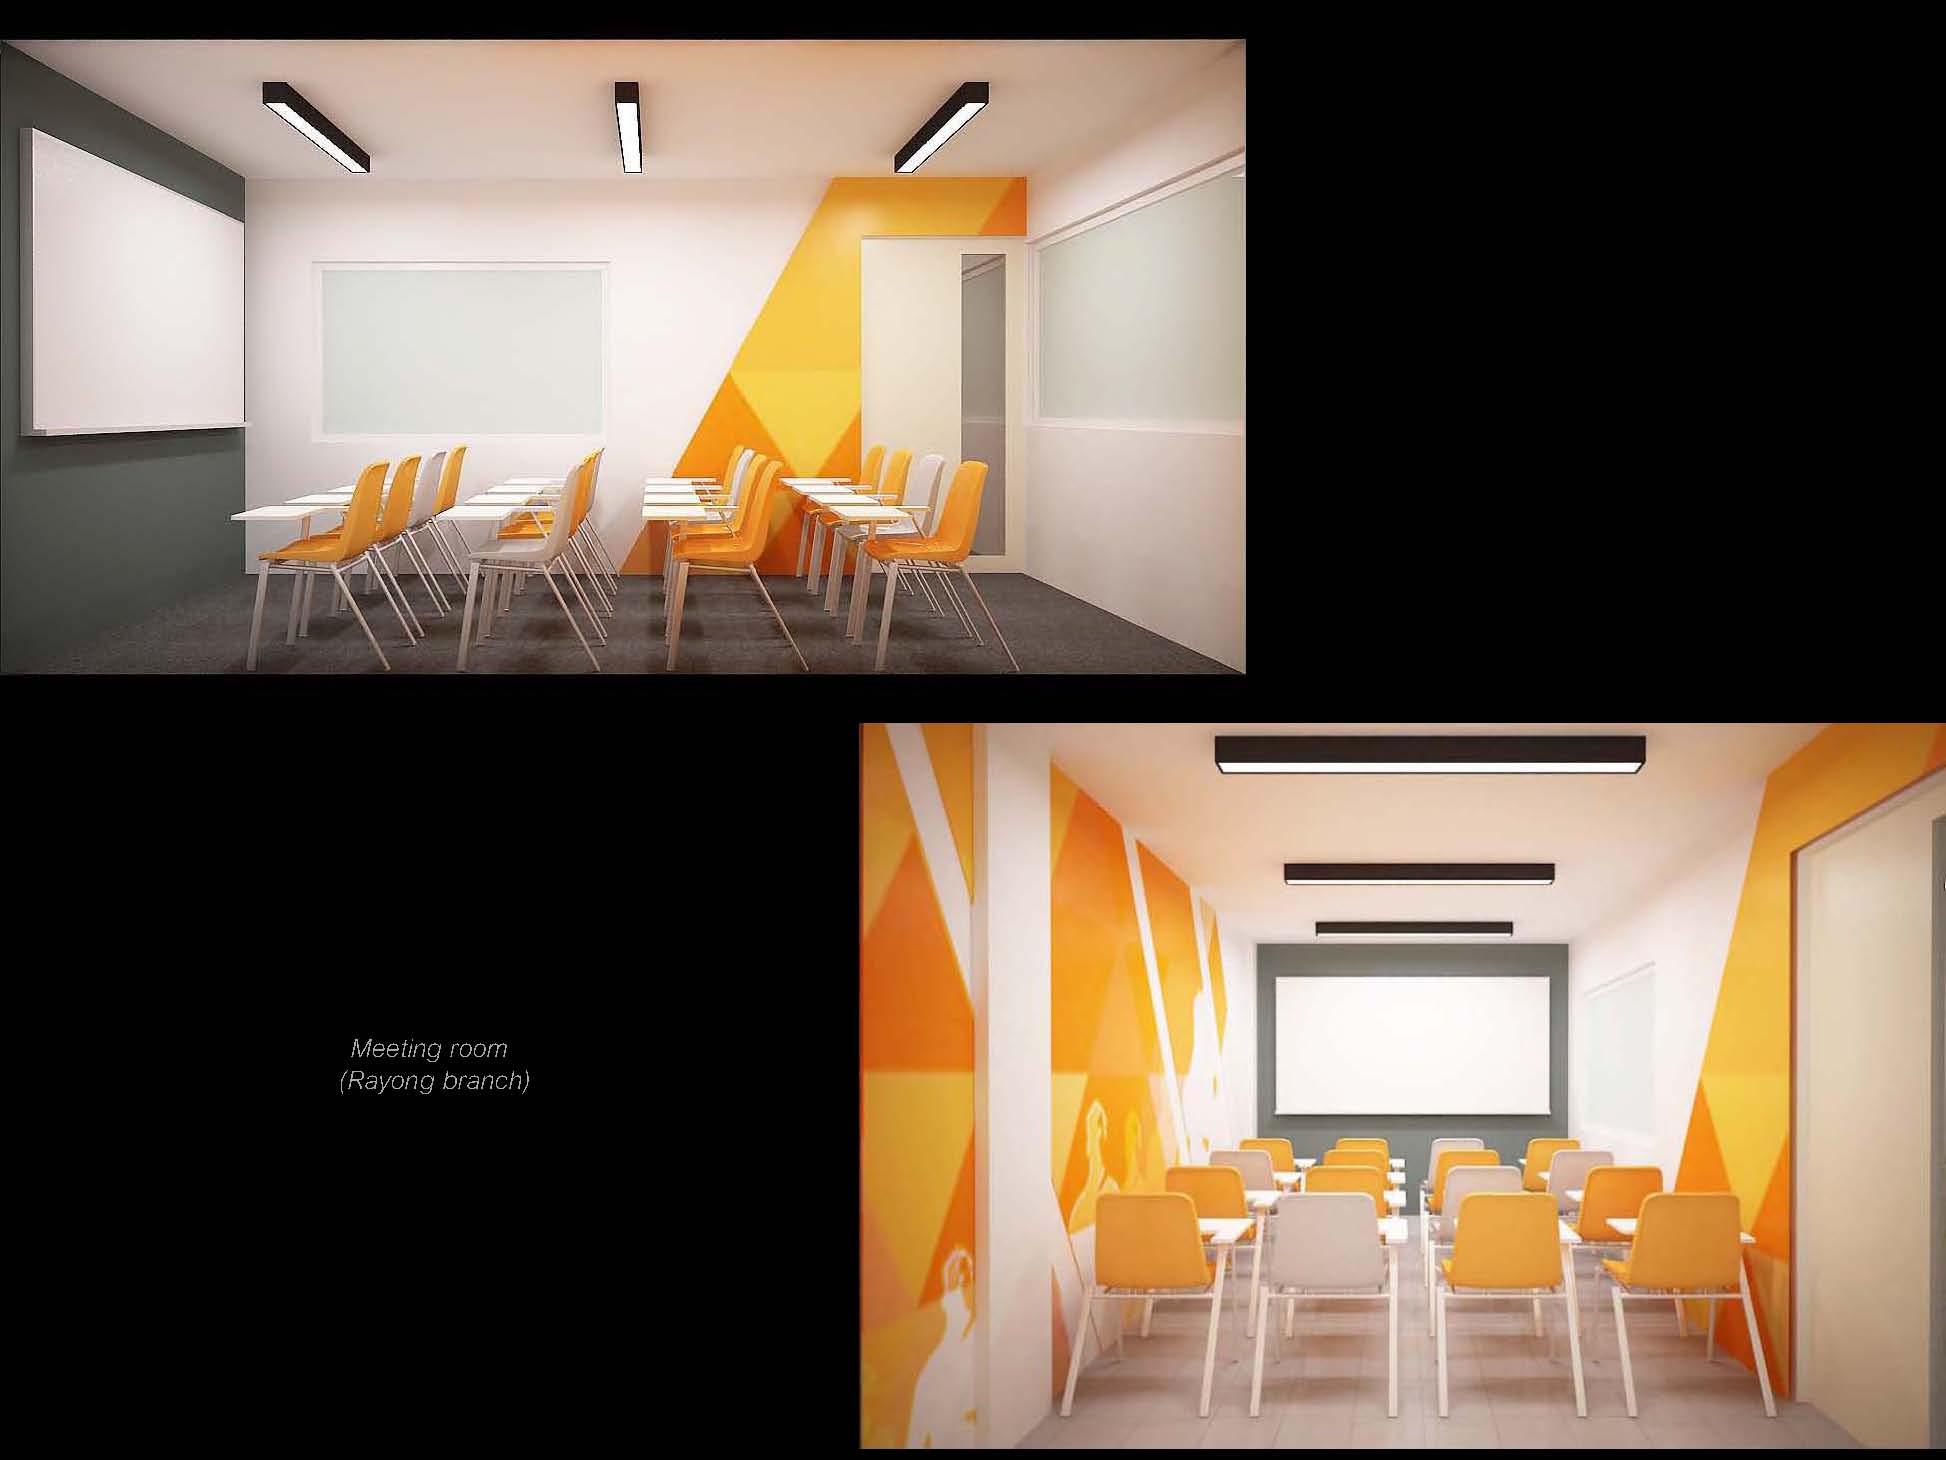 Meeting room (Medium size)